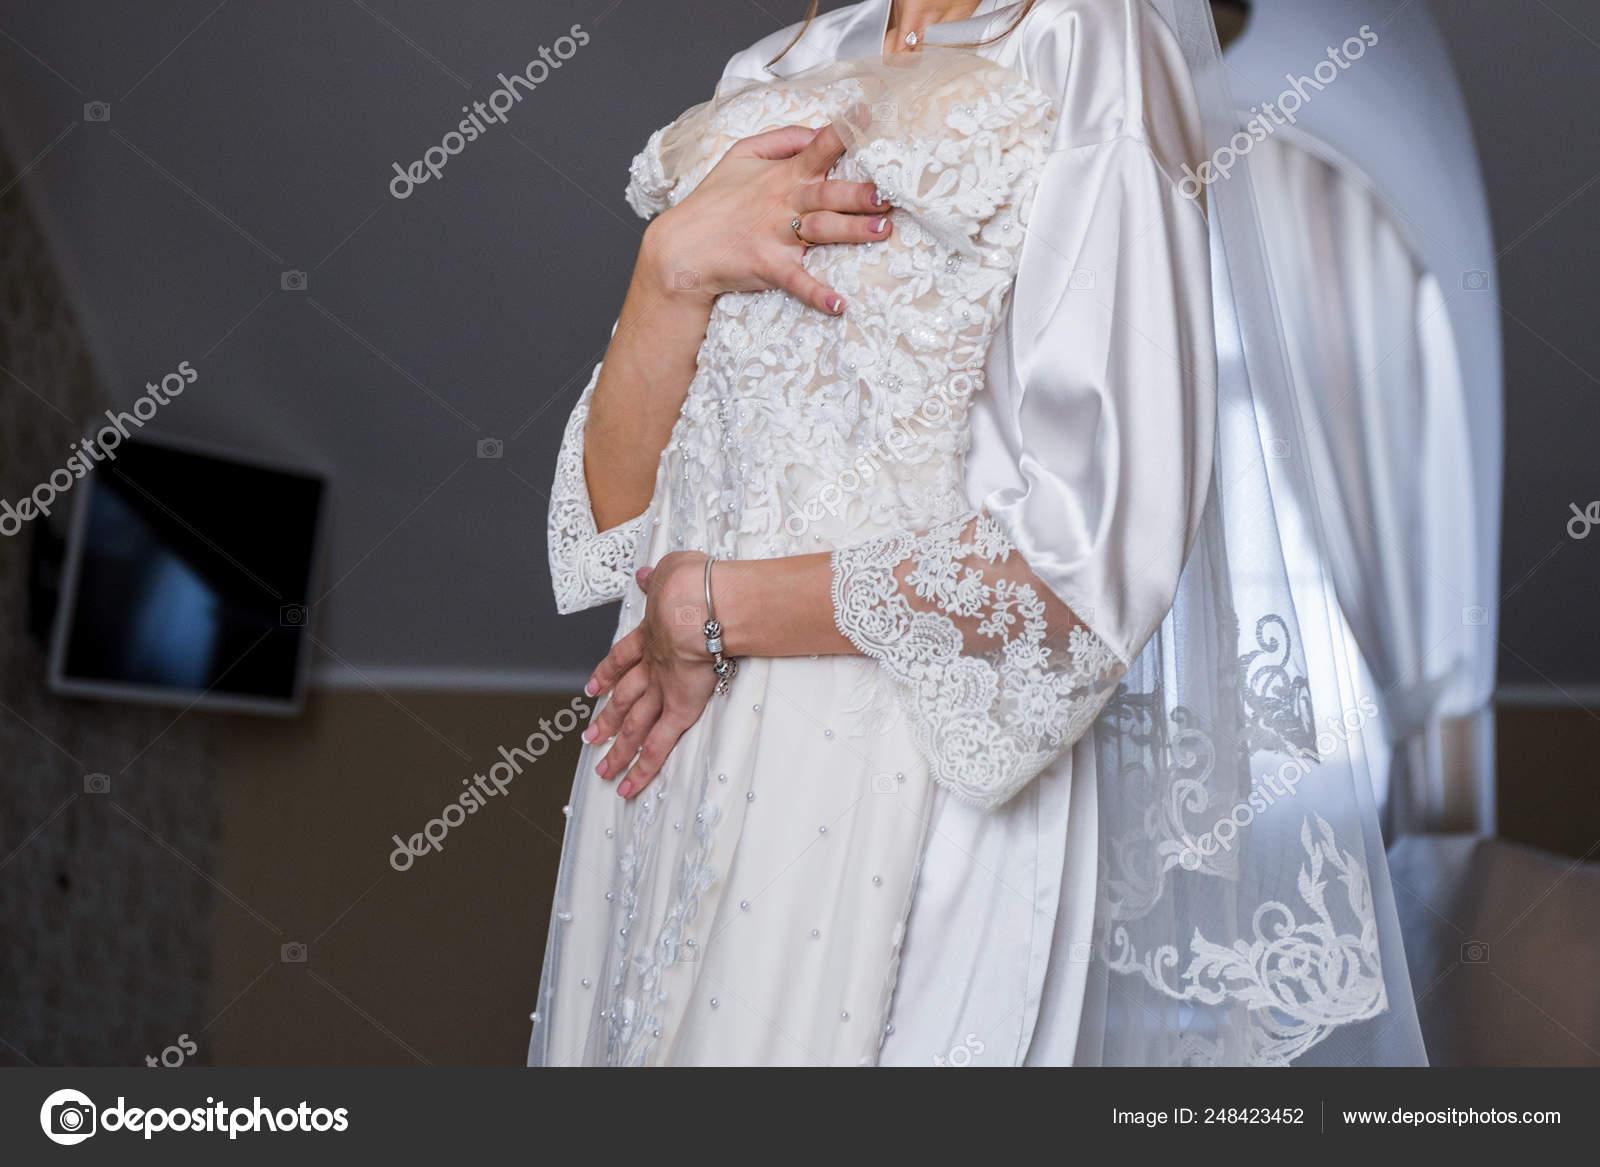 Bride In Bathrobe Holding Wedding Dress In Hands Stock Photo C Dyachenkoproduction Ukr Net 248423452